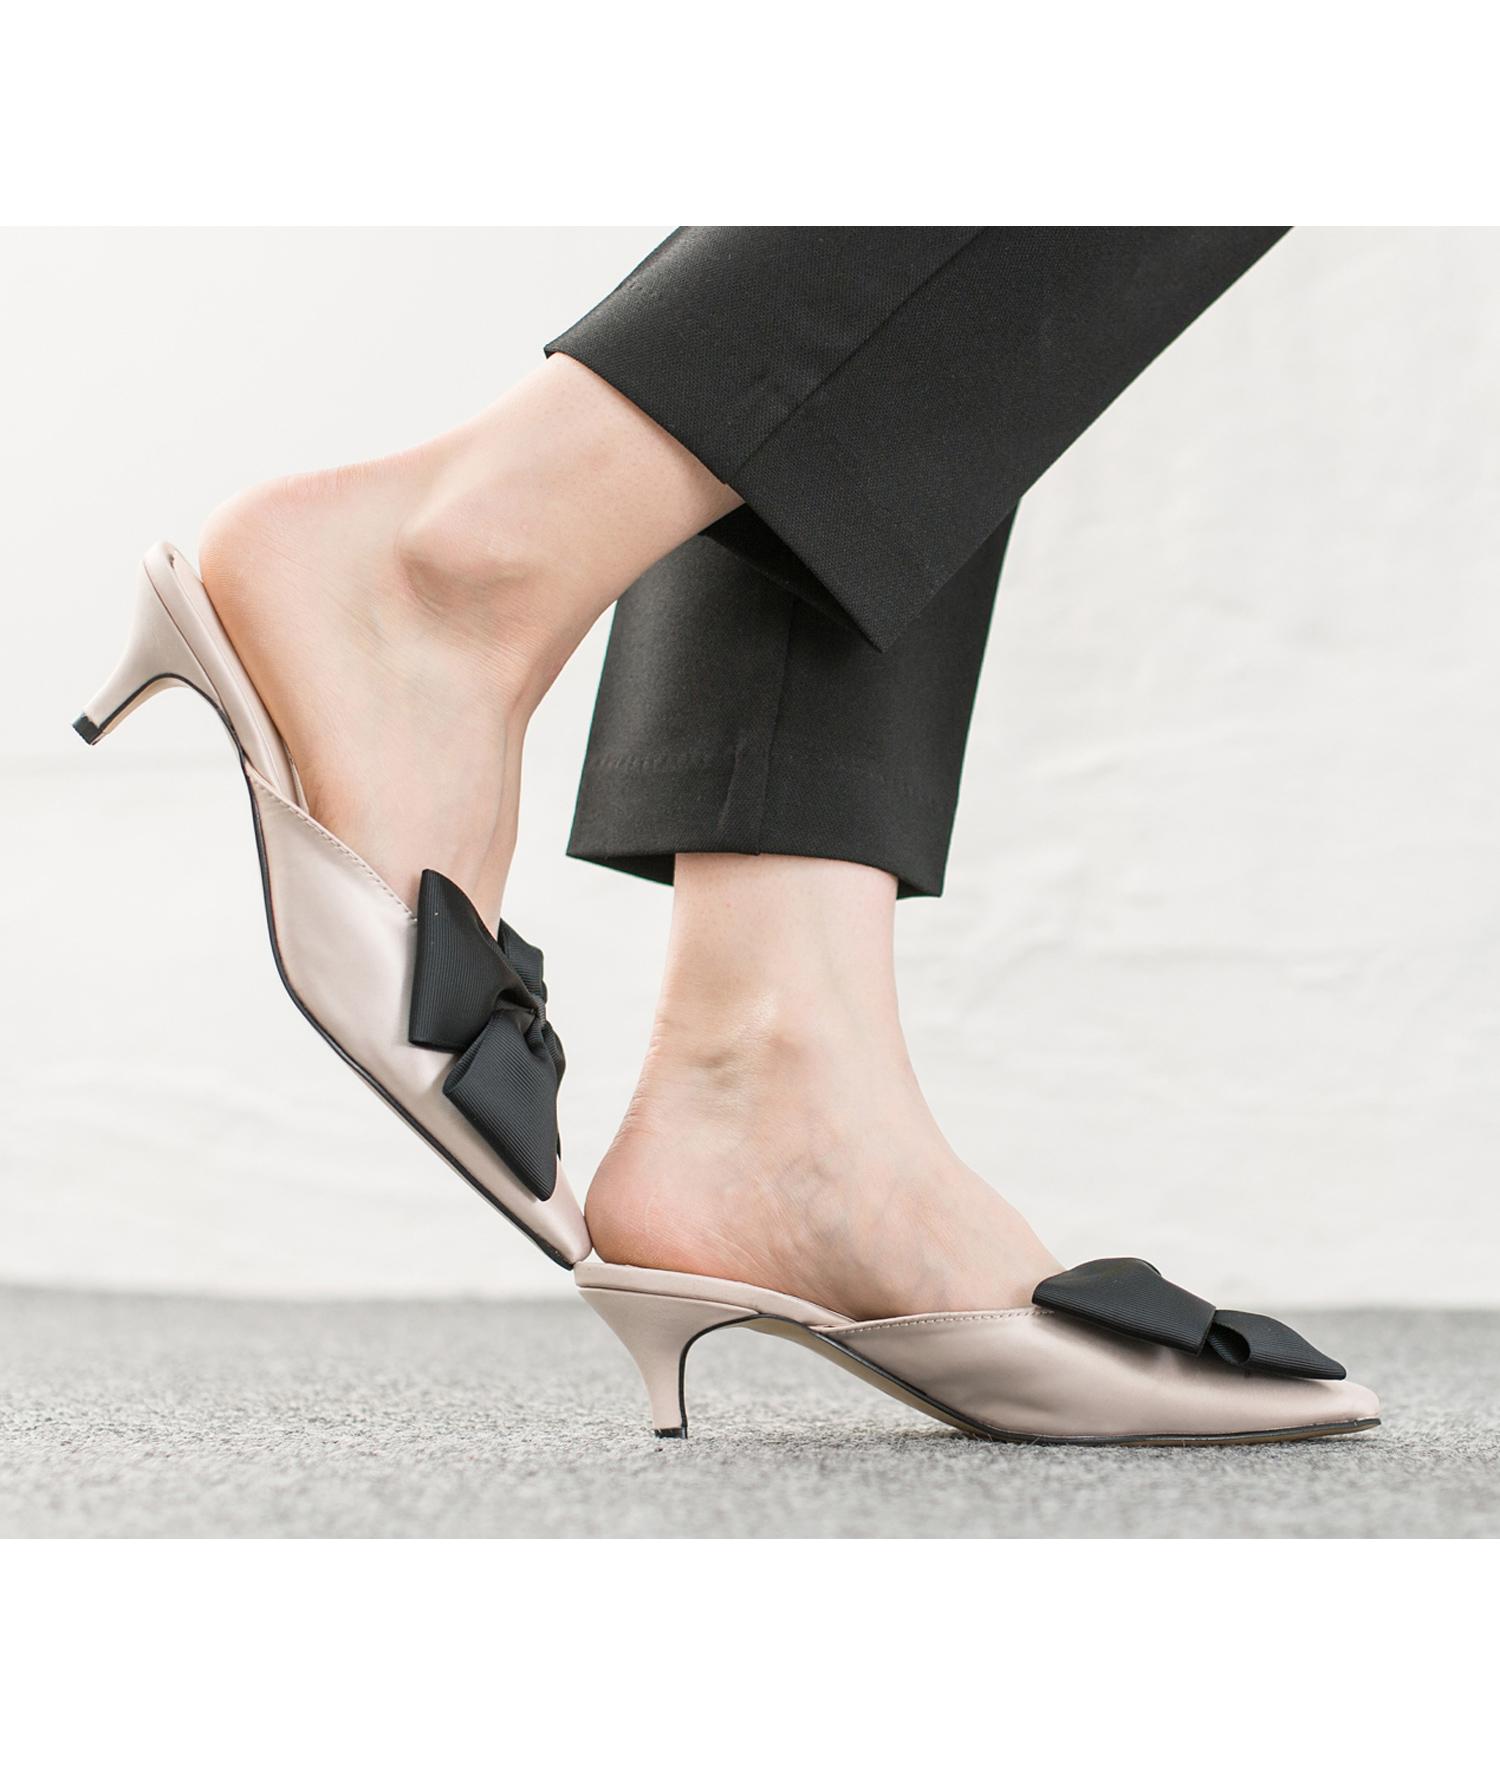 c6948649bad AnnaKastle Womens Big Bow Satin Low Kitten Heel Mule Sandal Beige